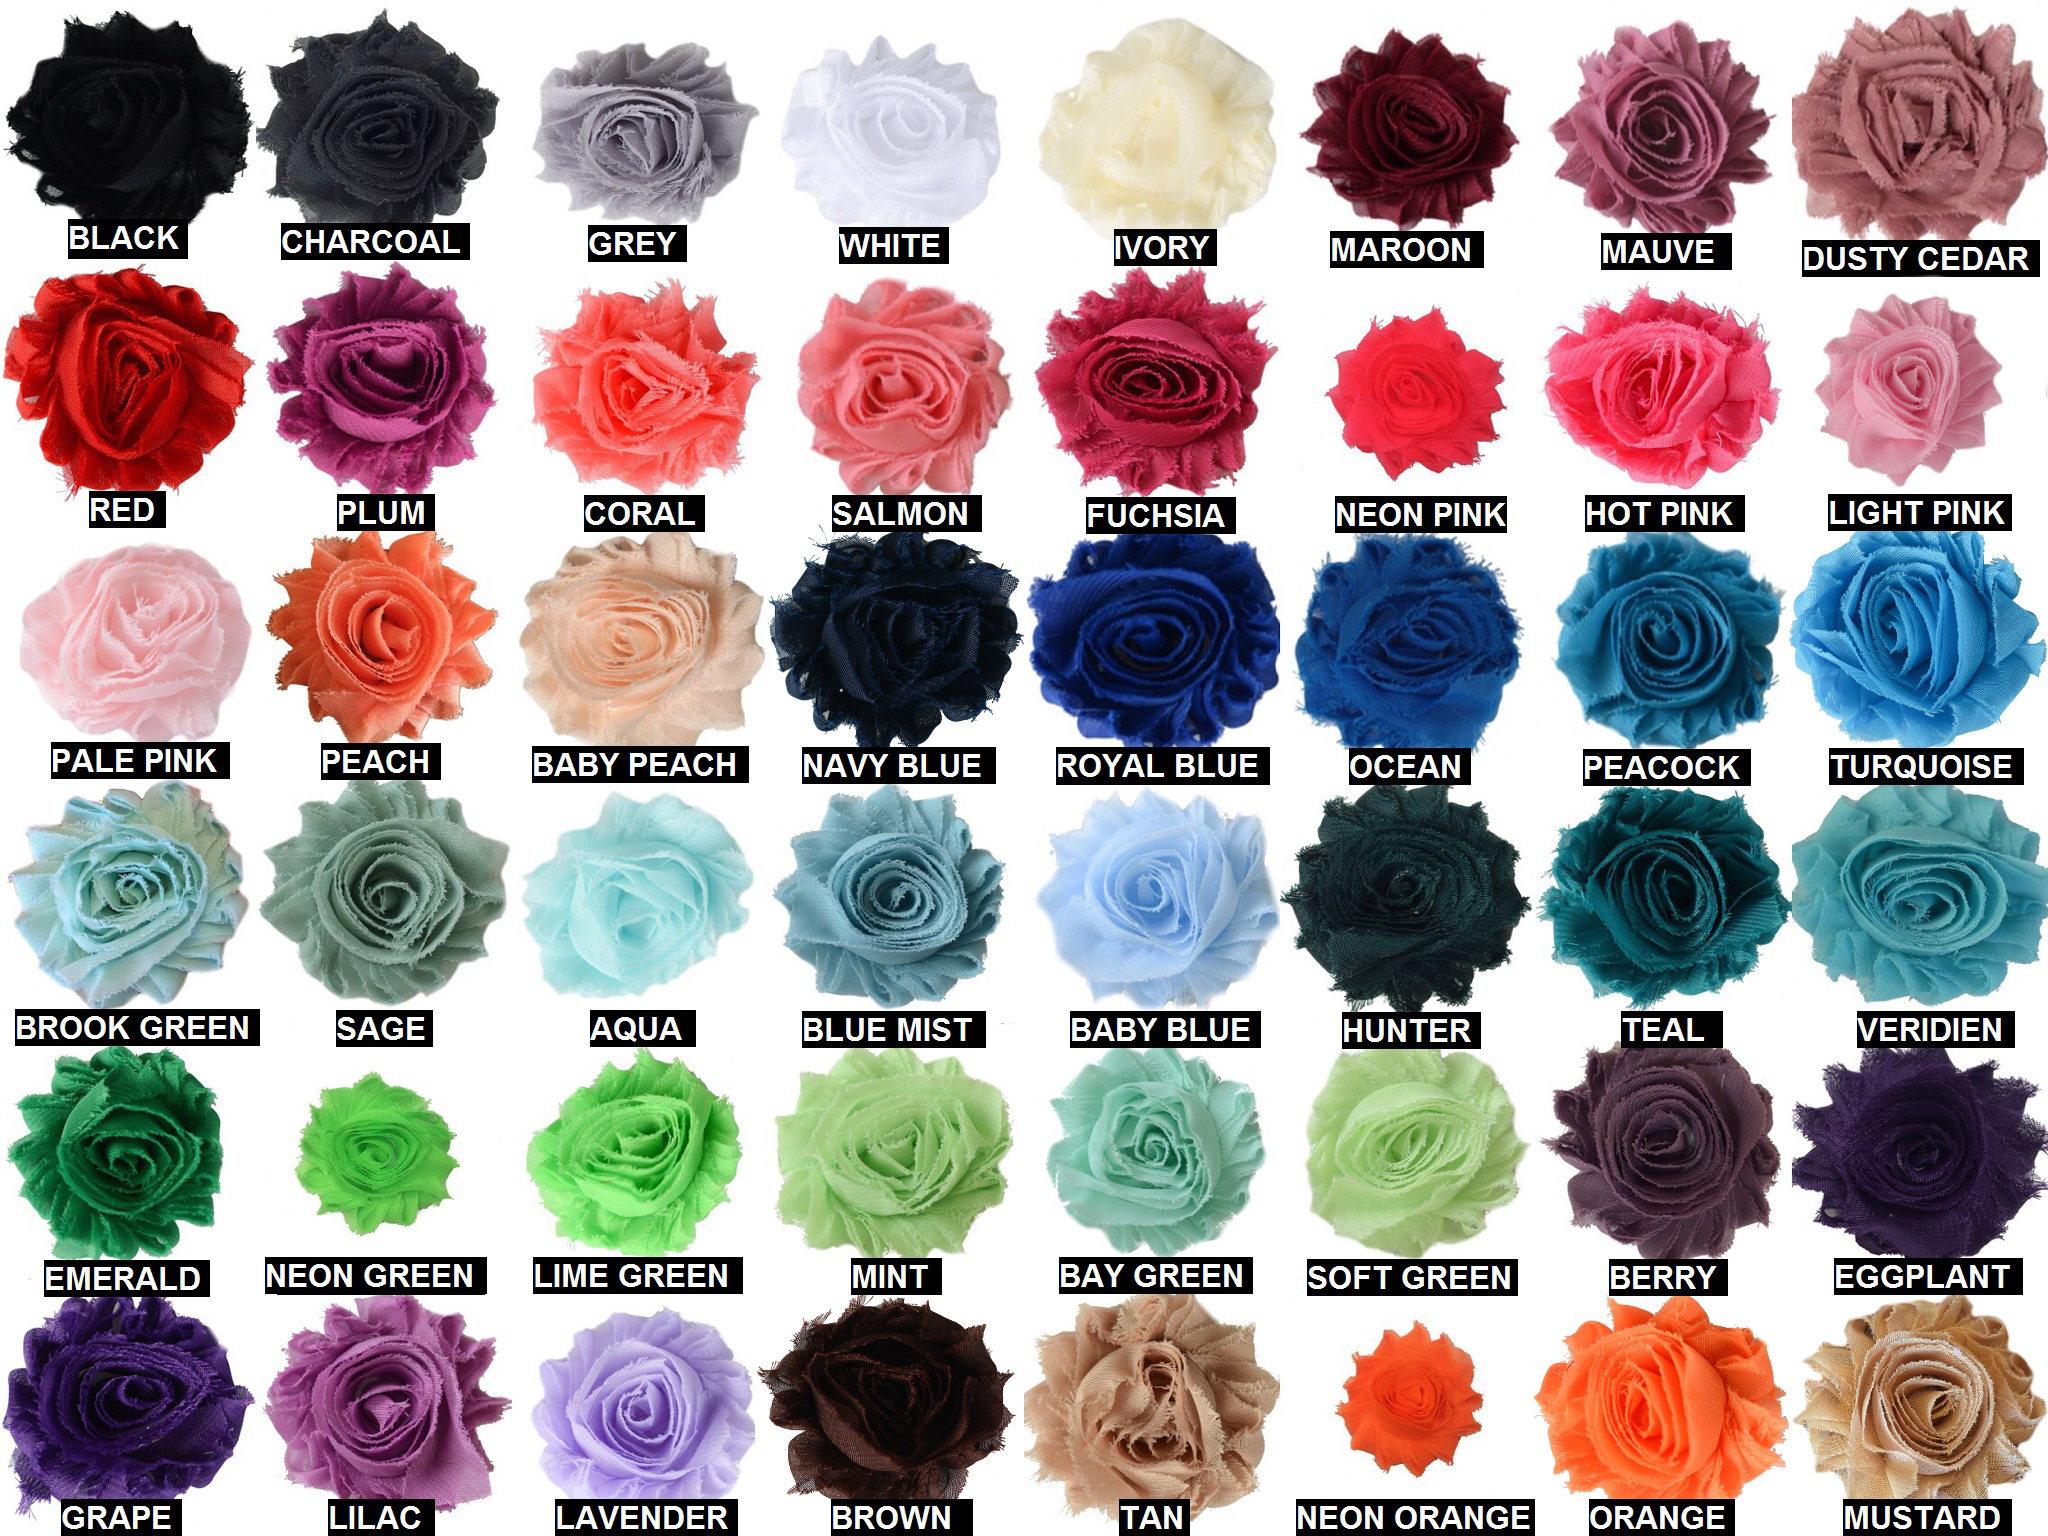 1.5 Shabby Chiffon Rose Trim Headband Supplies Lavender Shabby Flower Wholesale Trim Chiffon Flowers by the Yard